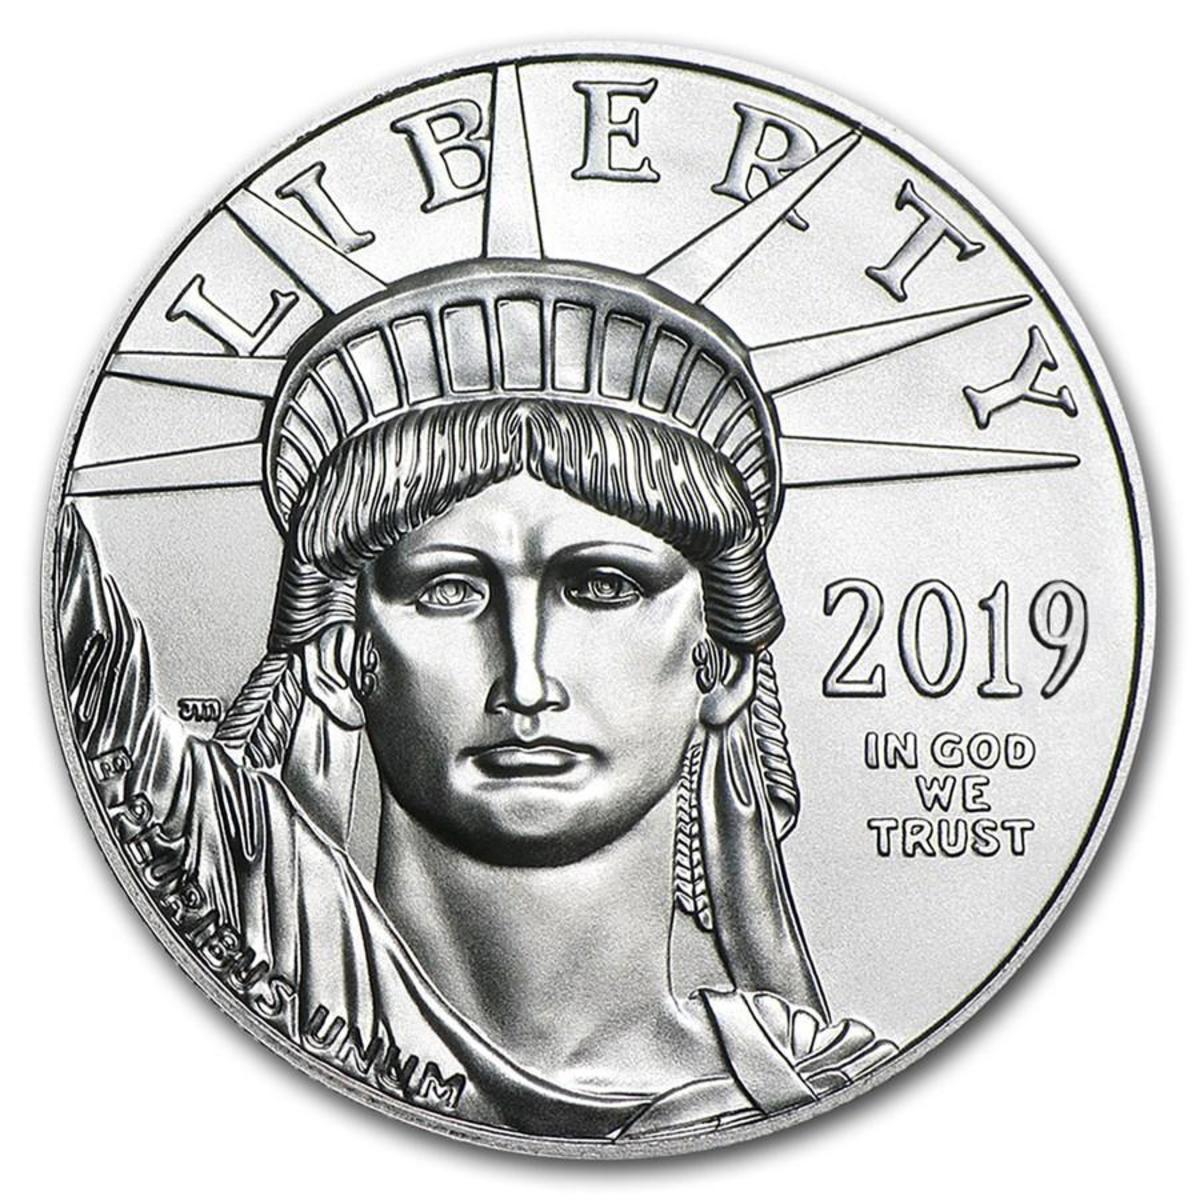 American Federal Rare Coin & Buillion